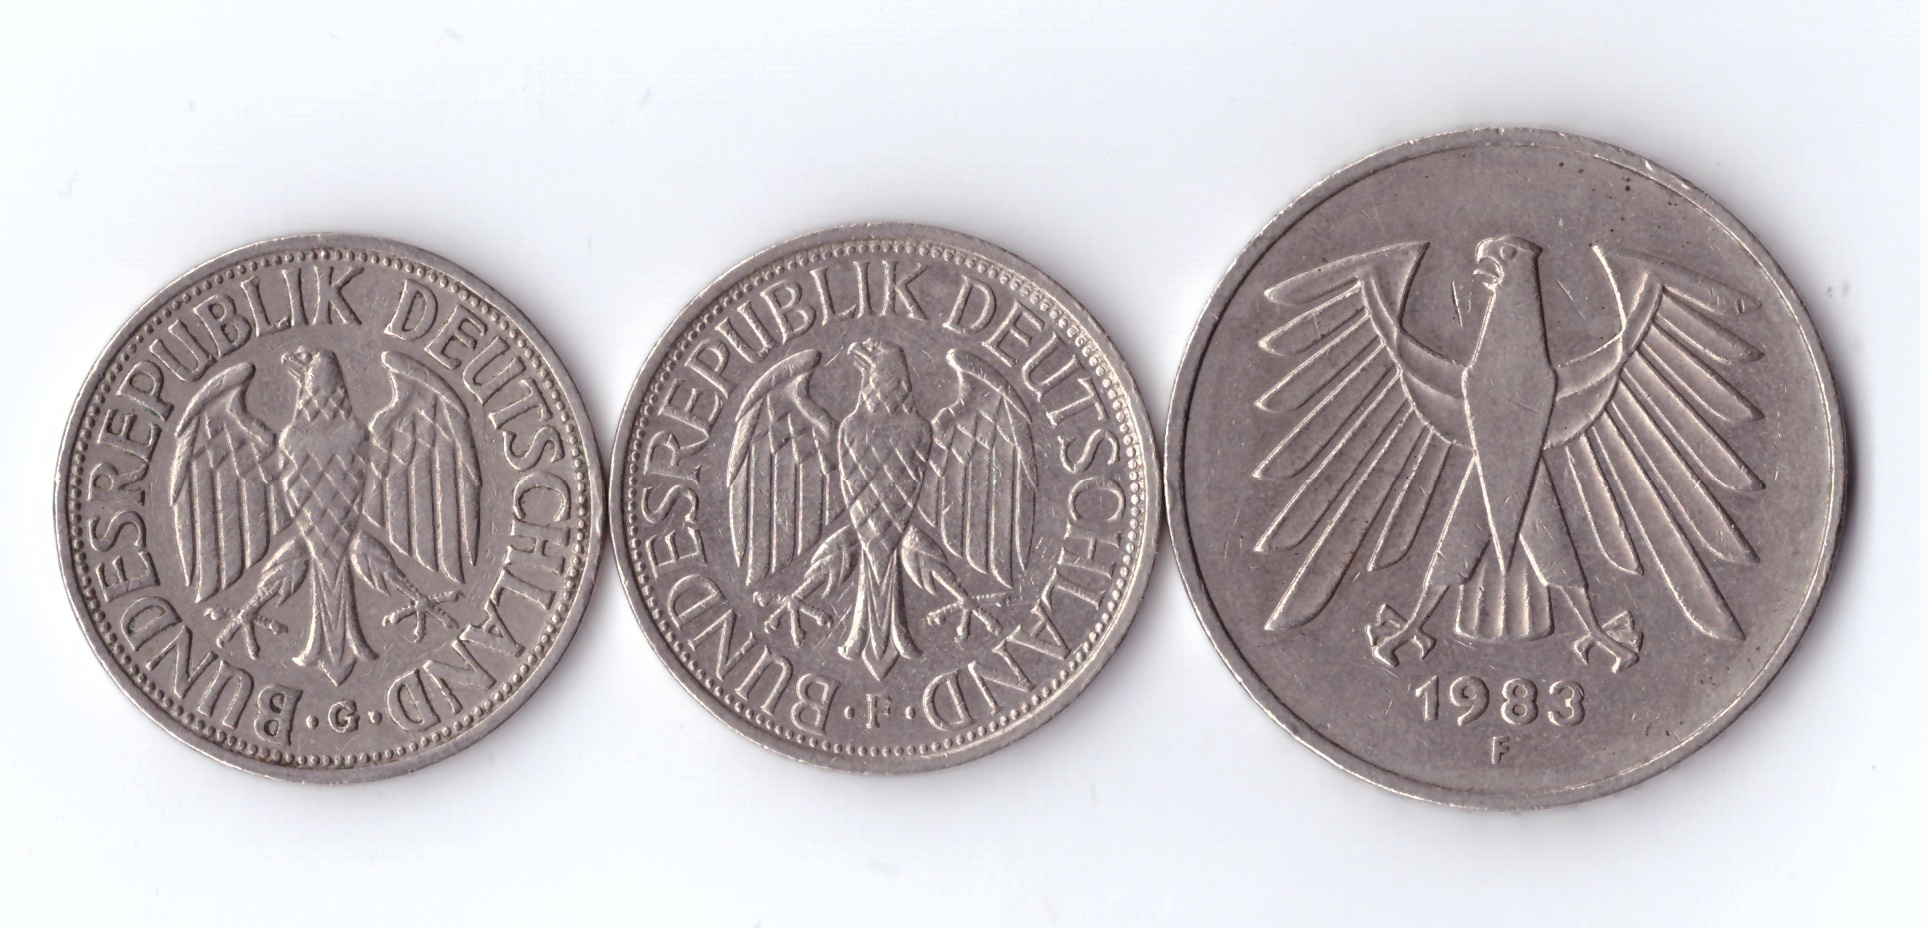 Набор из 3 монет ФРГ номиналом 1 и 5 марок (1950-1988гг).